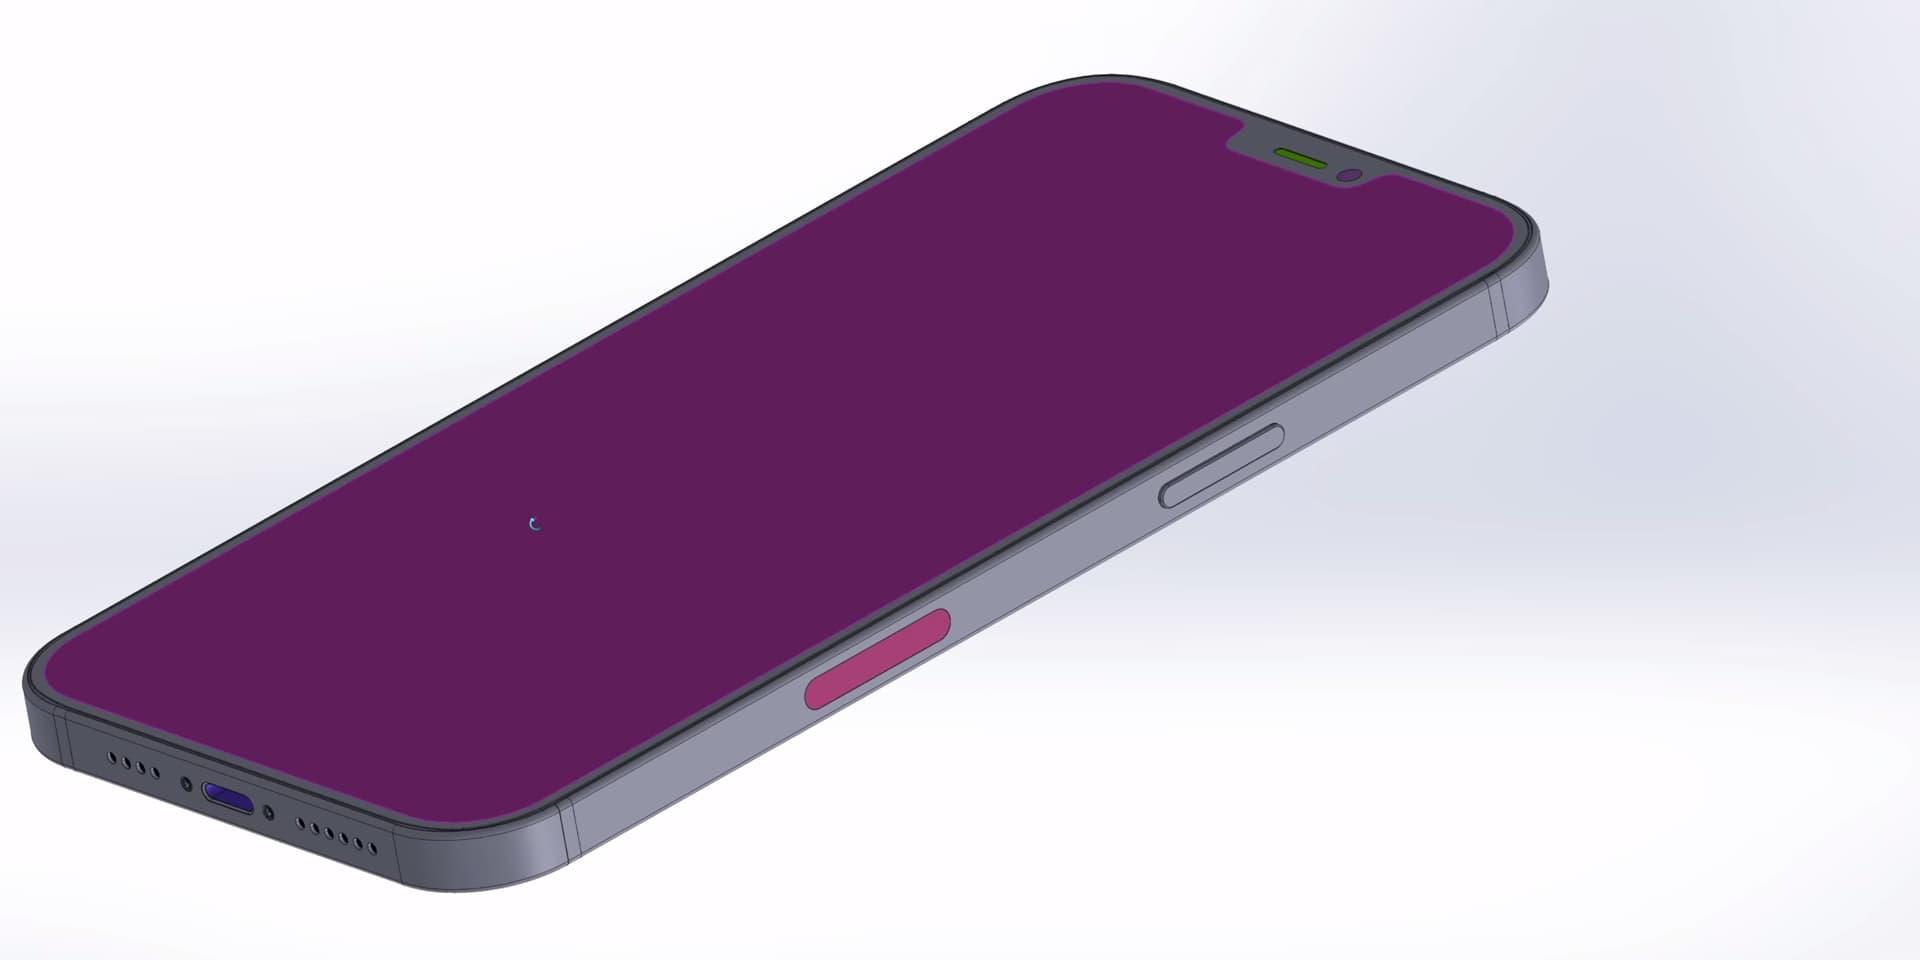 iPhone 將加入 Smart Connector 支援 Pencil